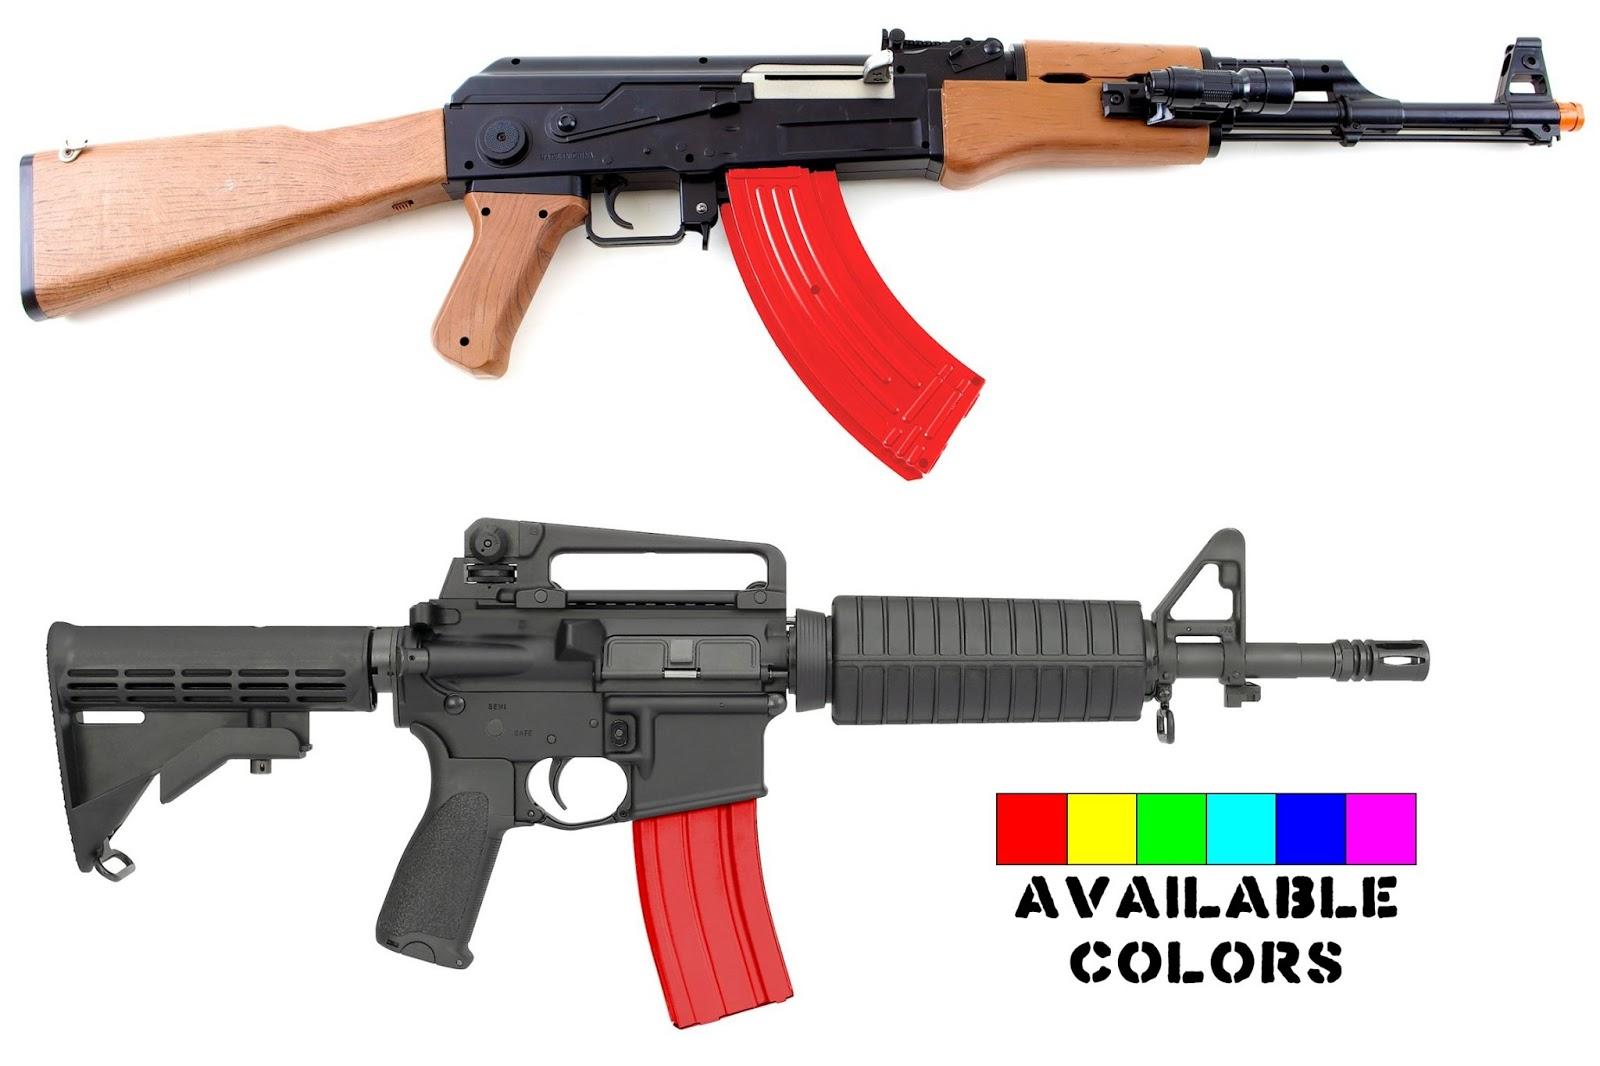 AK+47+and+AR+15.jpg